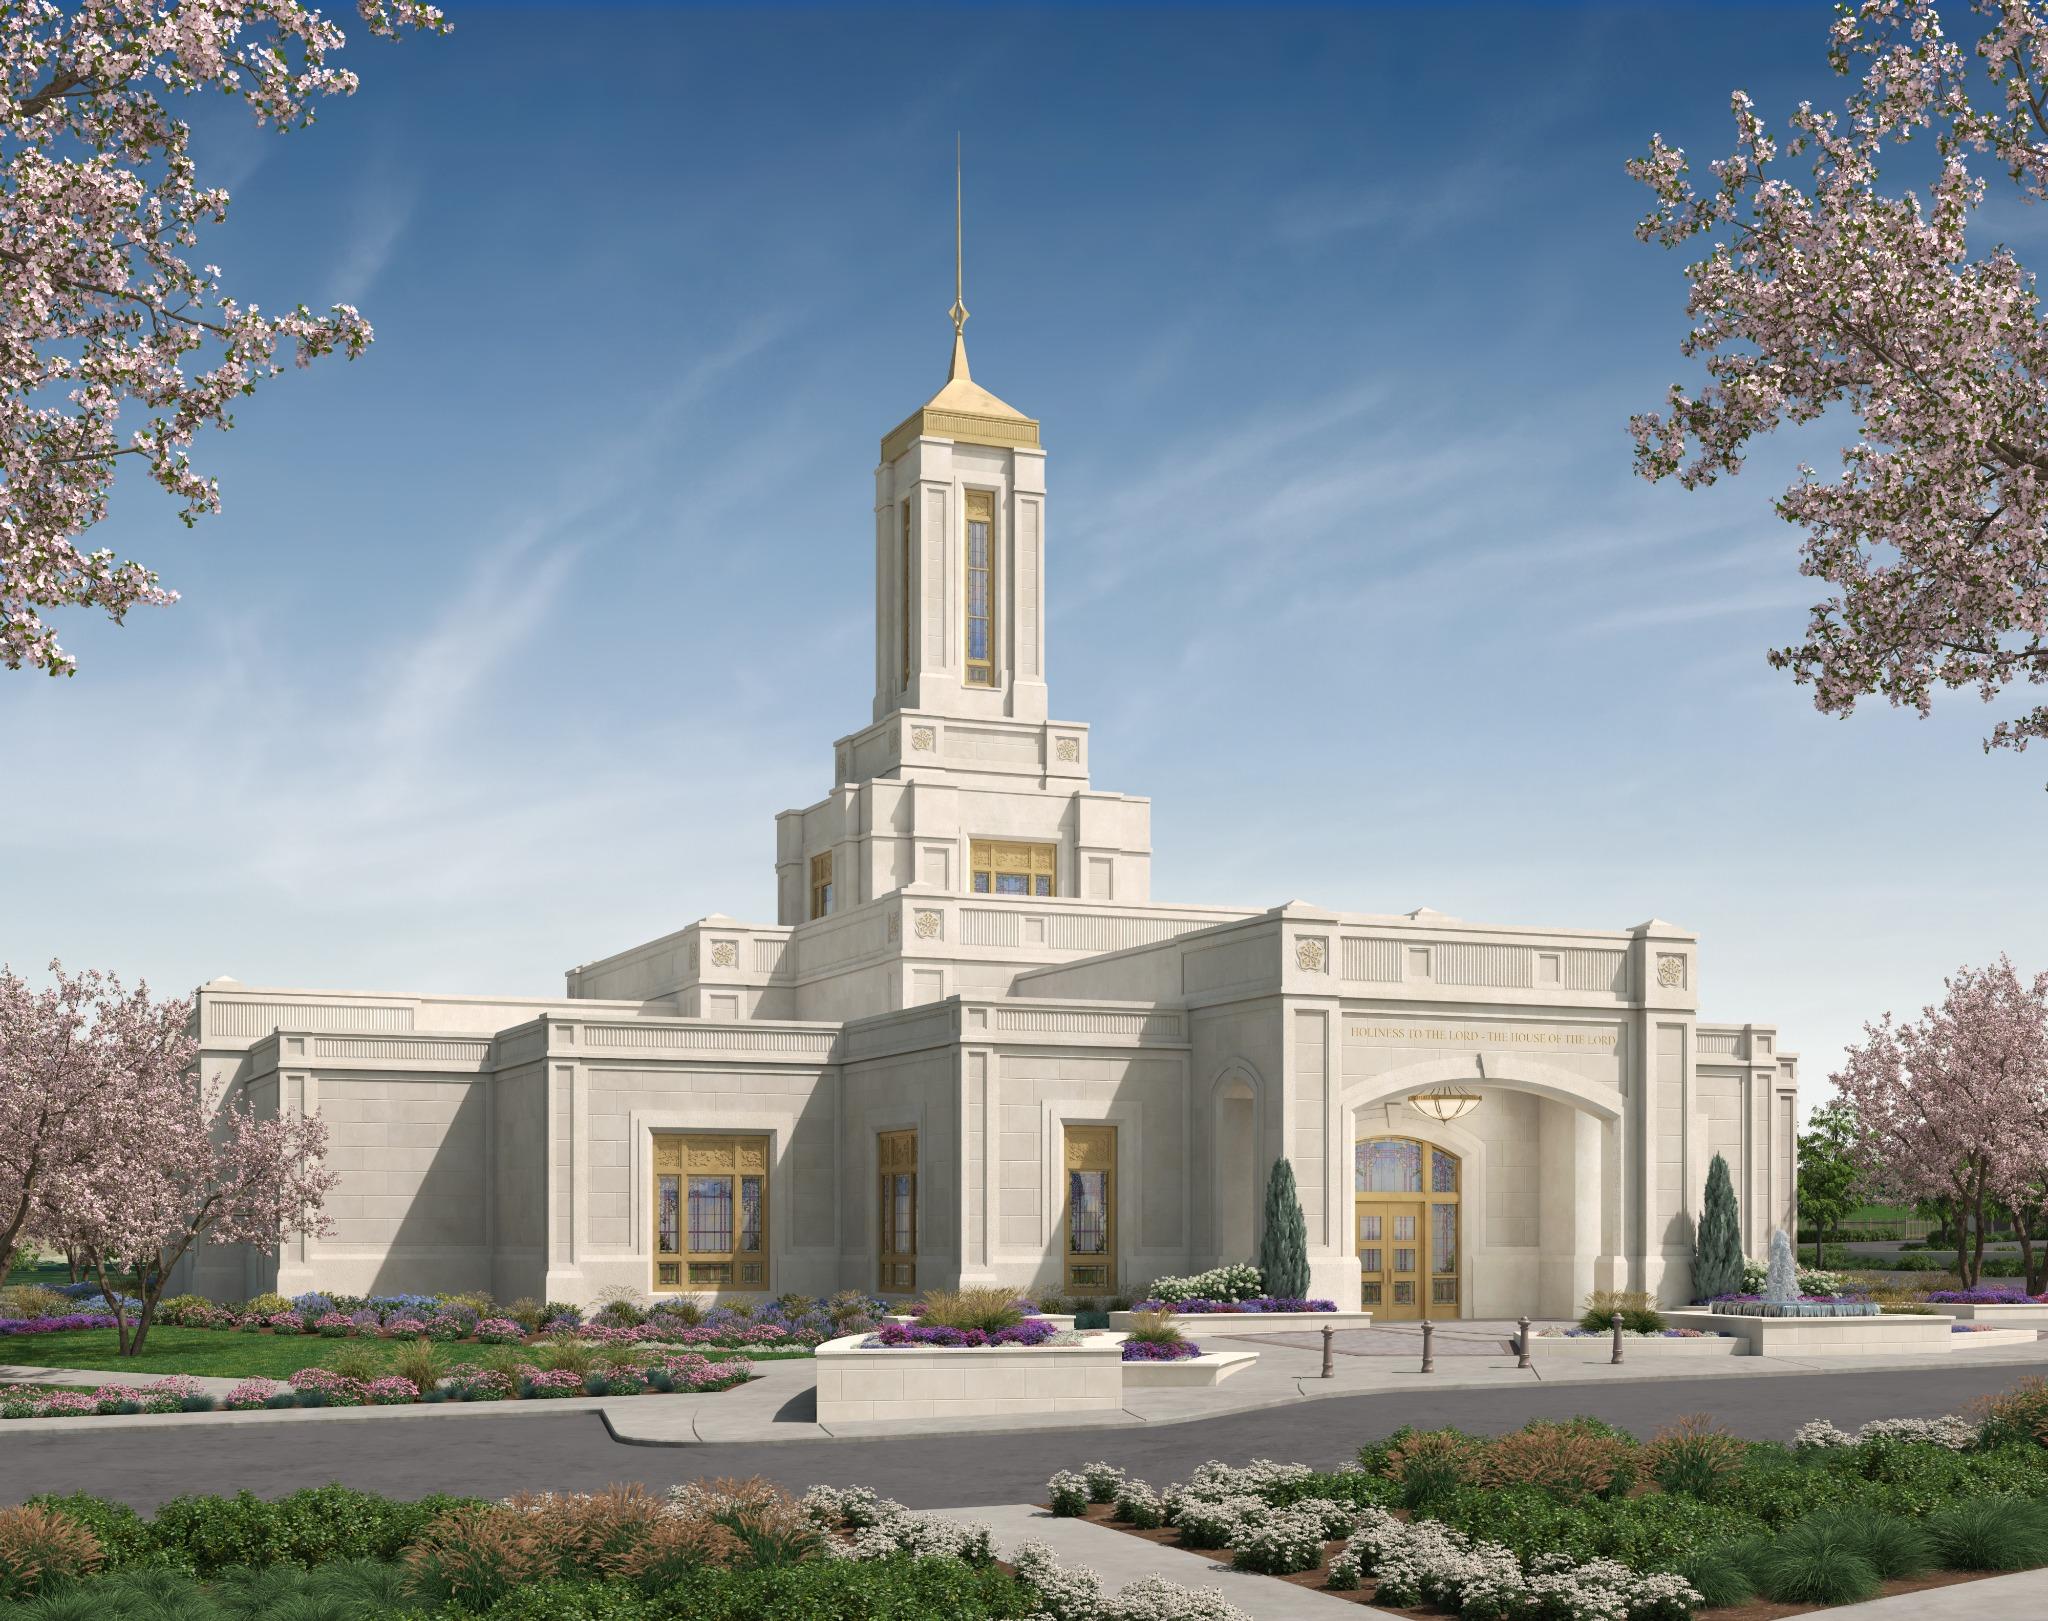 Pittsburgh Pennsylvania Temple - 30,000 sq. ft